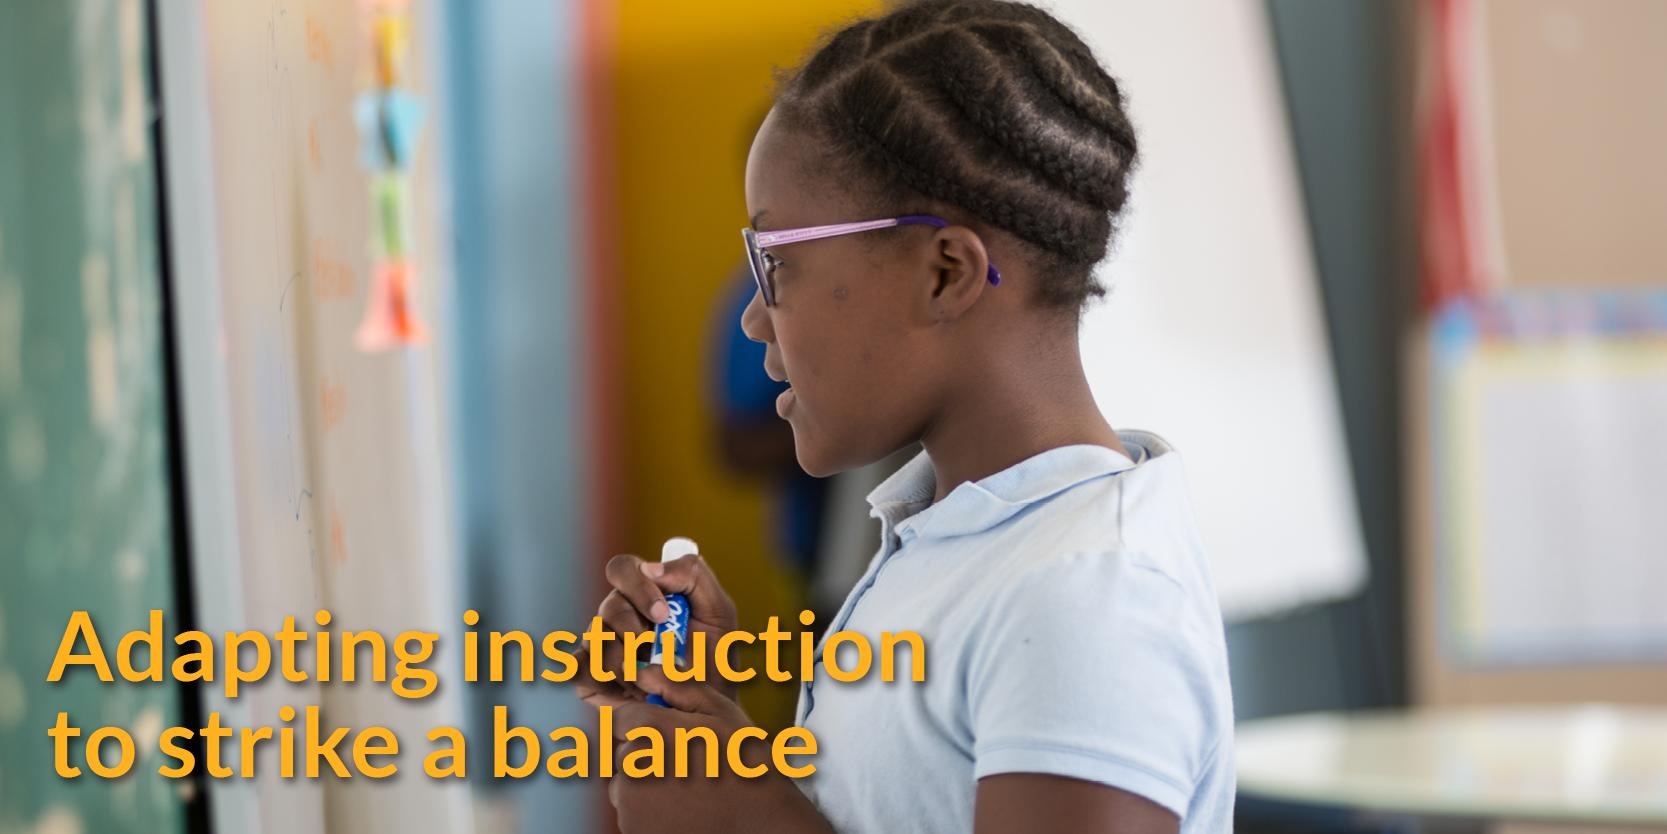 Adapting instruction to strike a balance